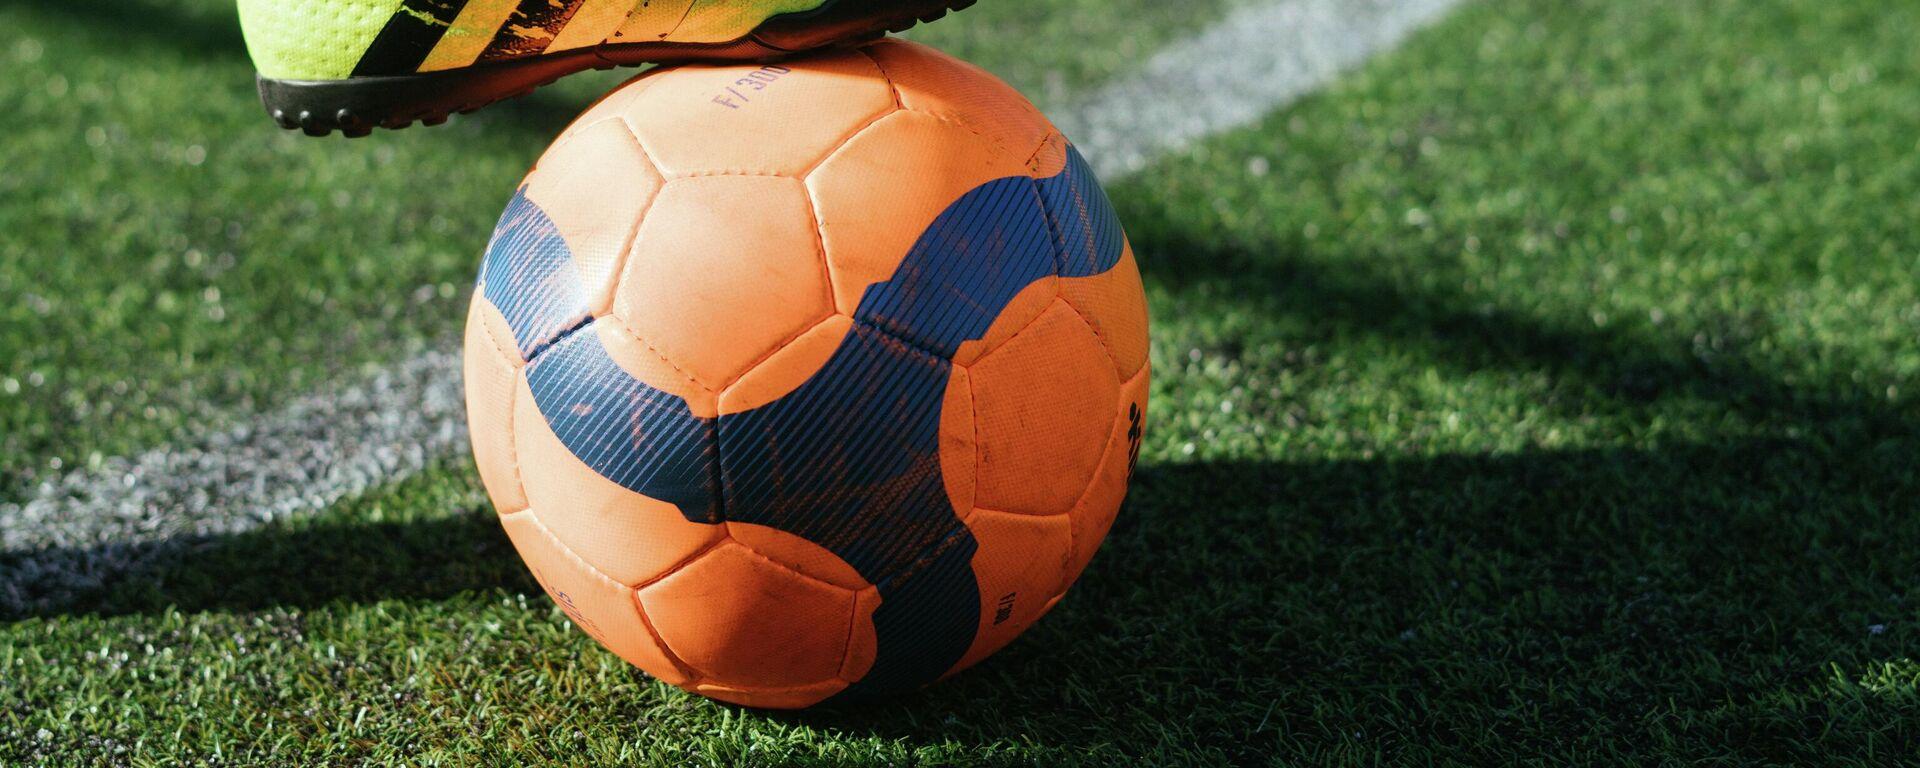 Fútbol, foto de archivo - Sputnik Mundo, 1920, 08.05.2021